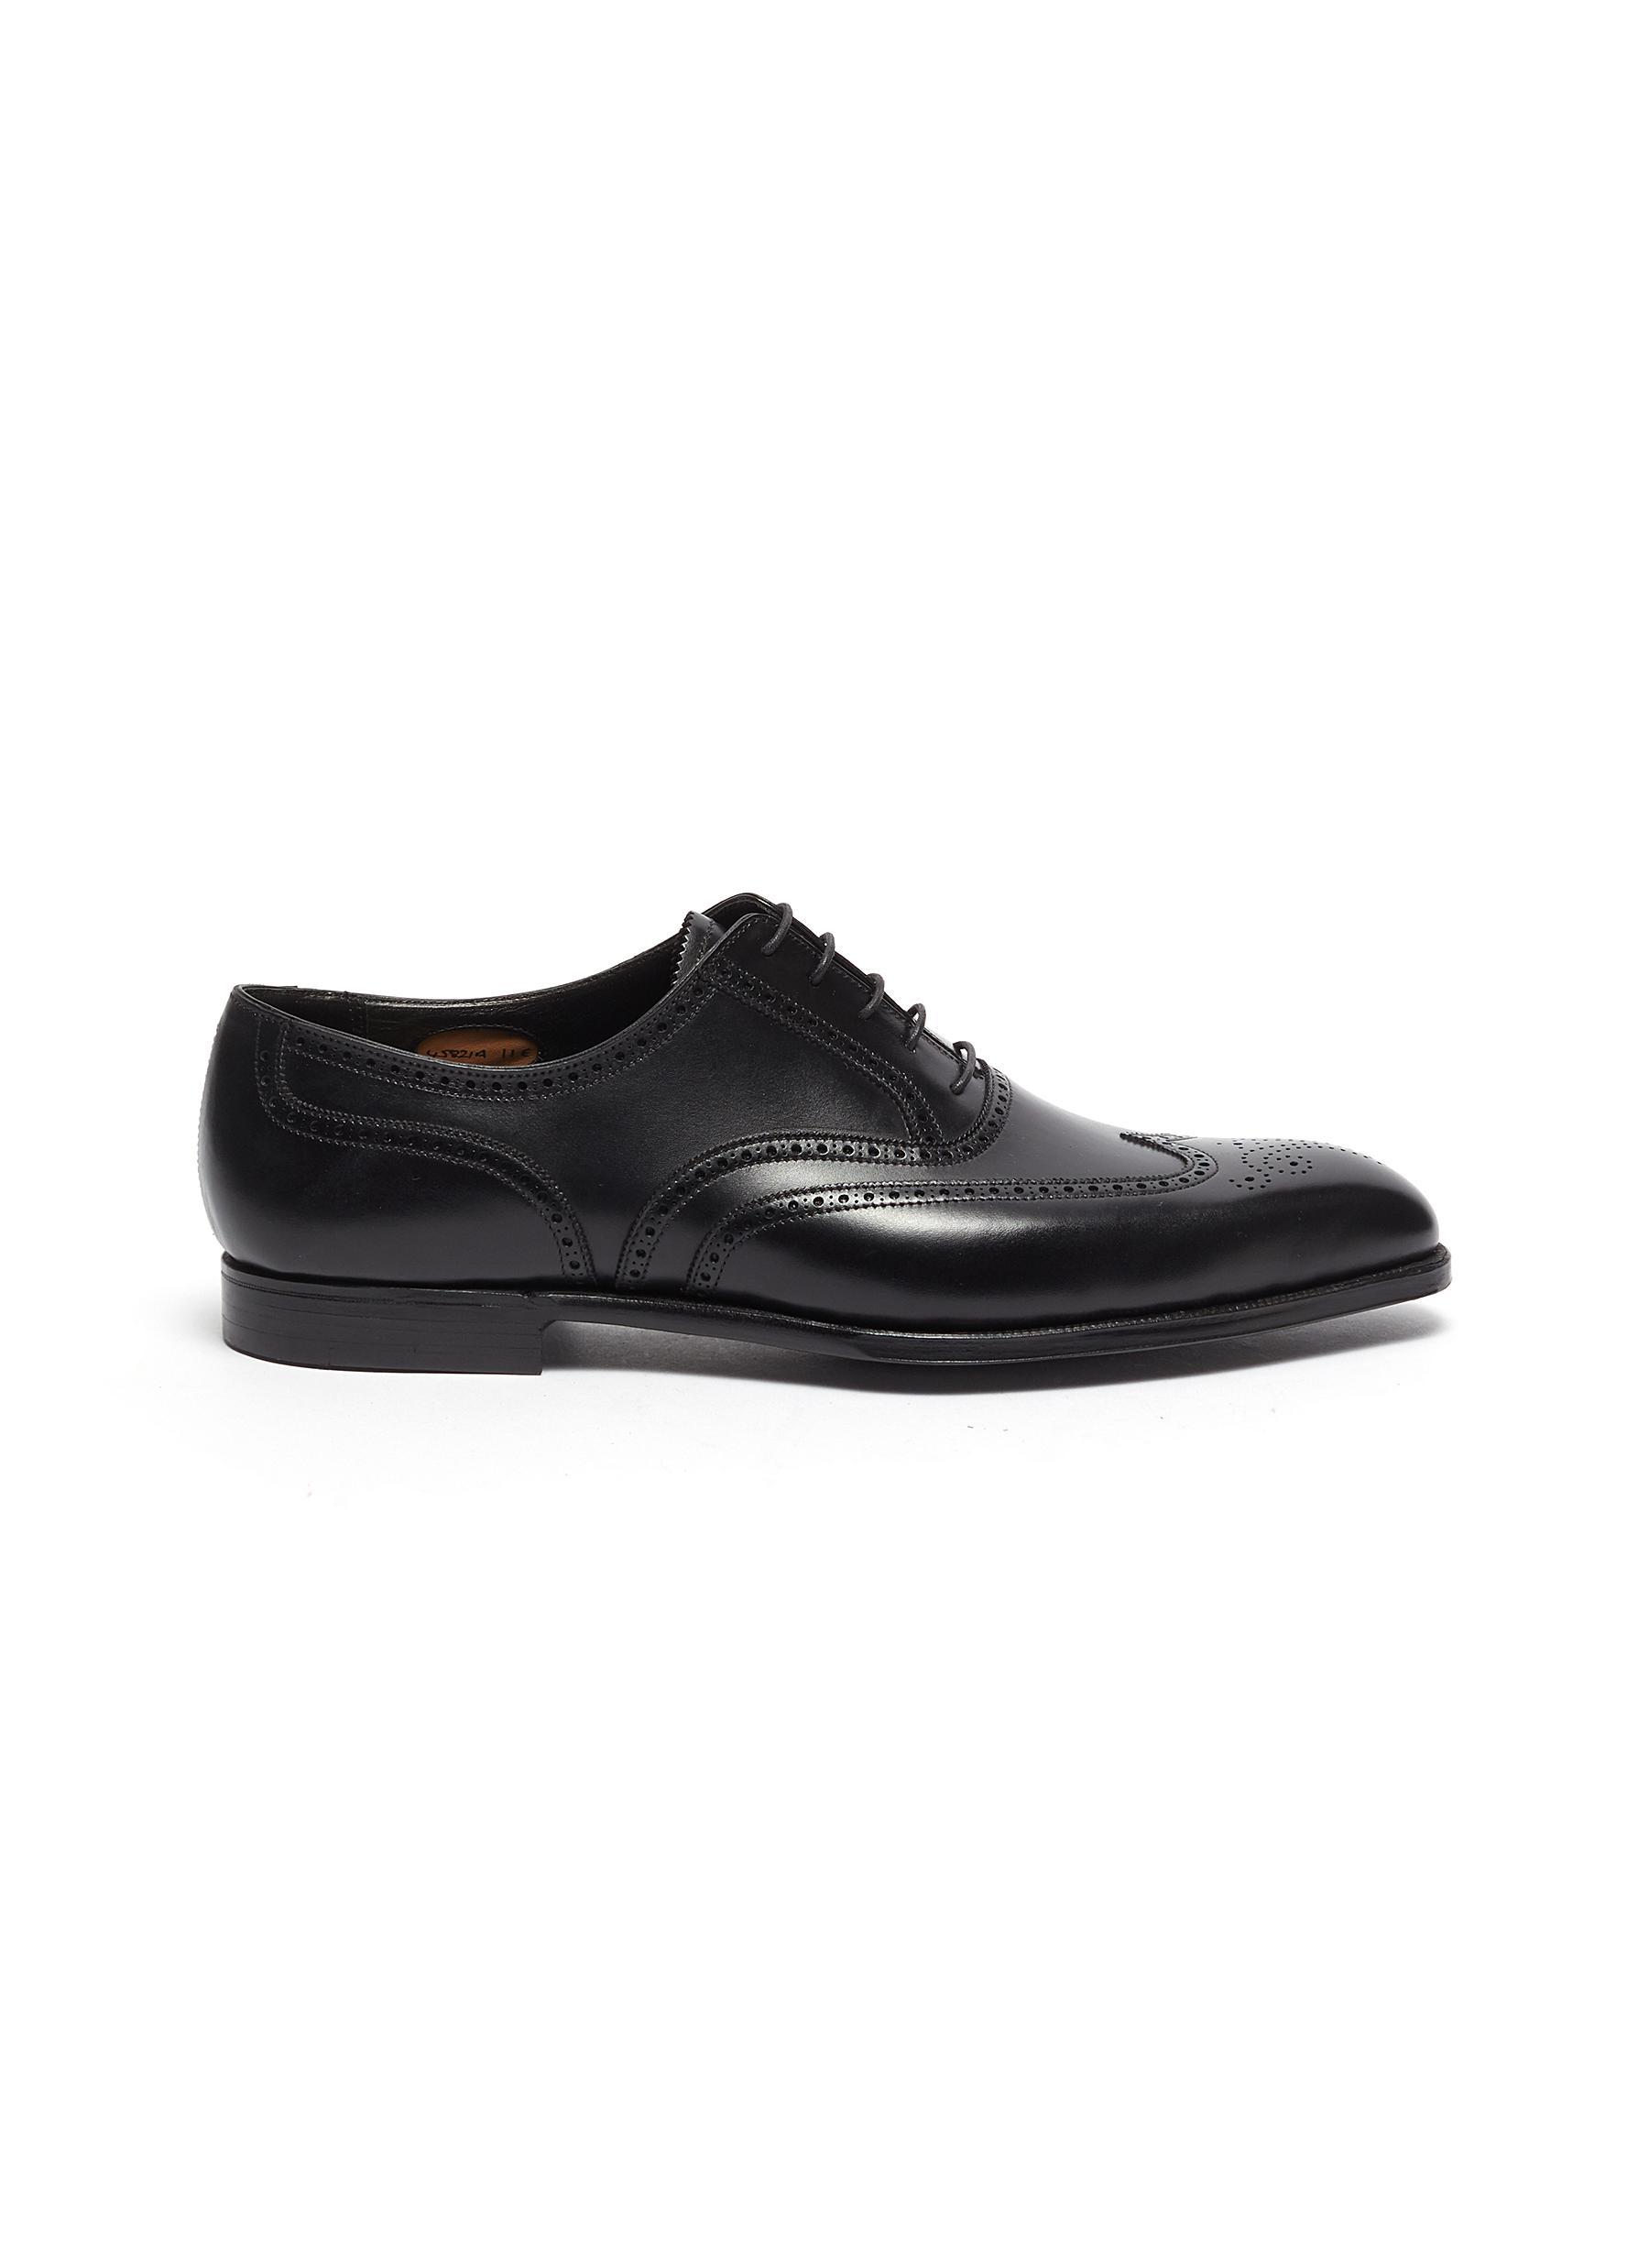 Reuben' Chisel Toe Leather Brogue Shoes